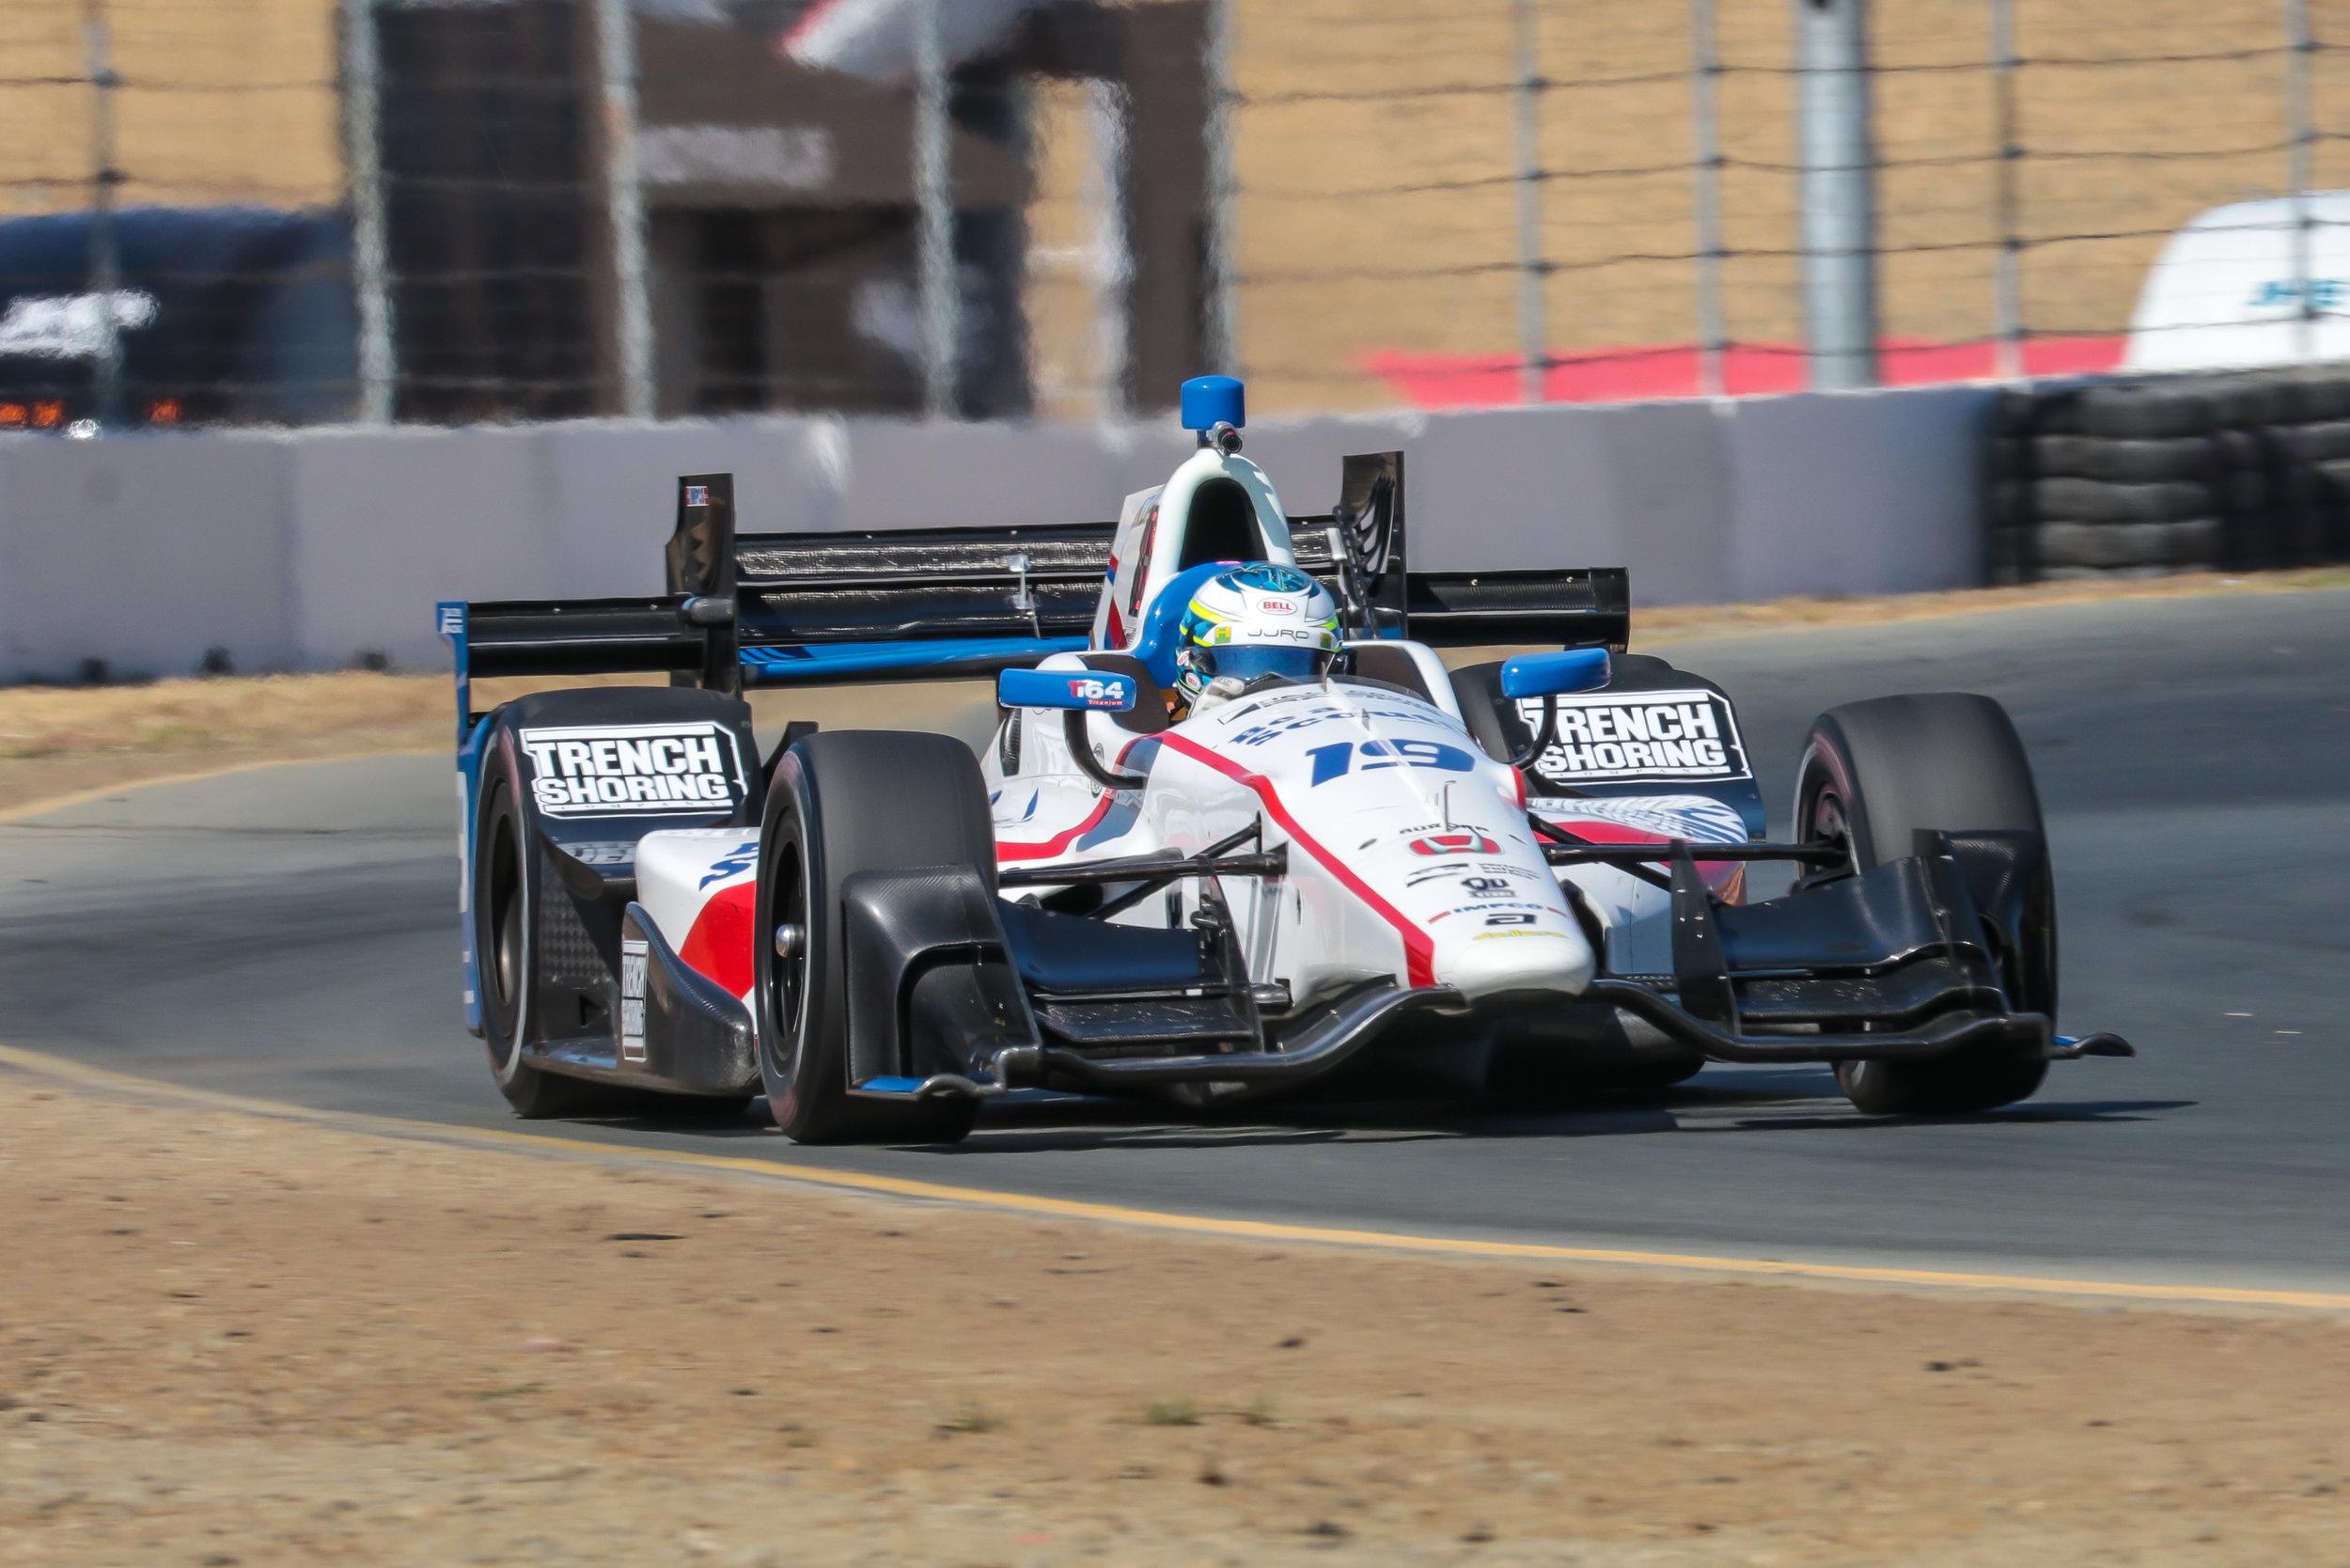 Indy16-2382.jpg